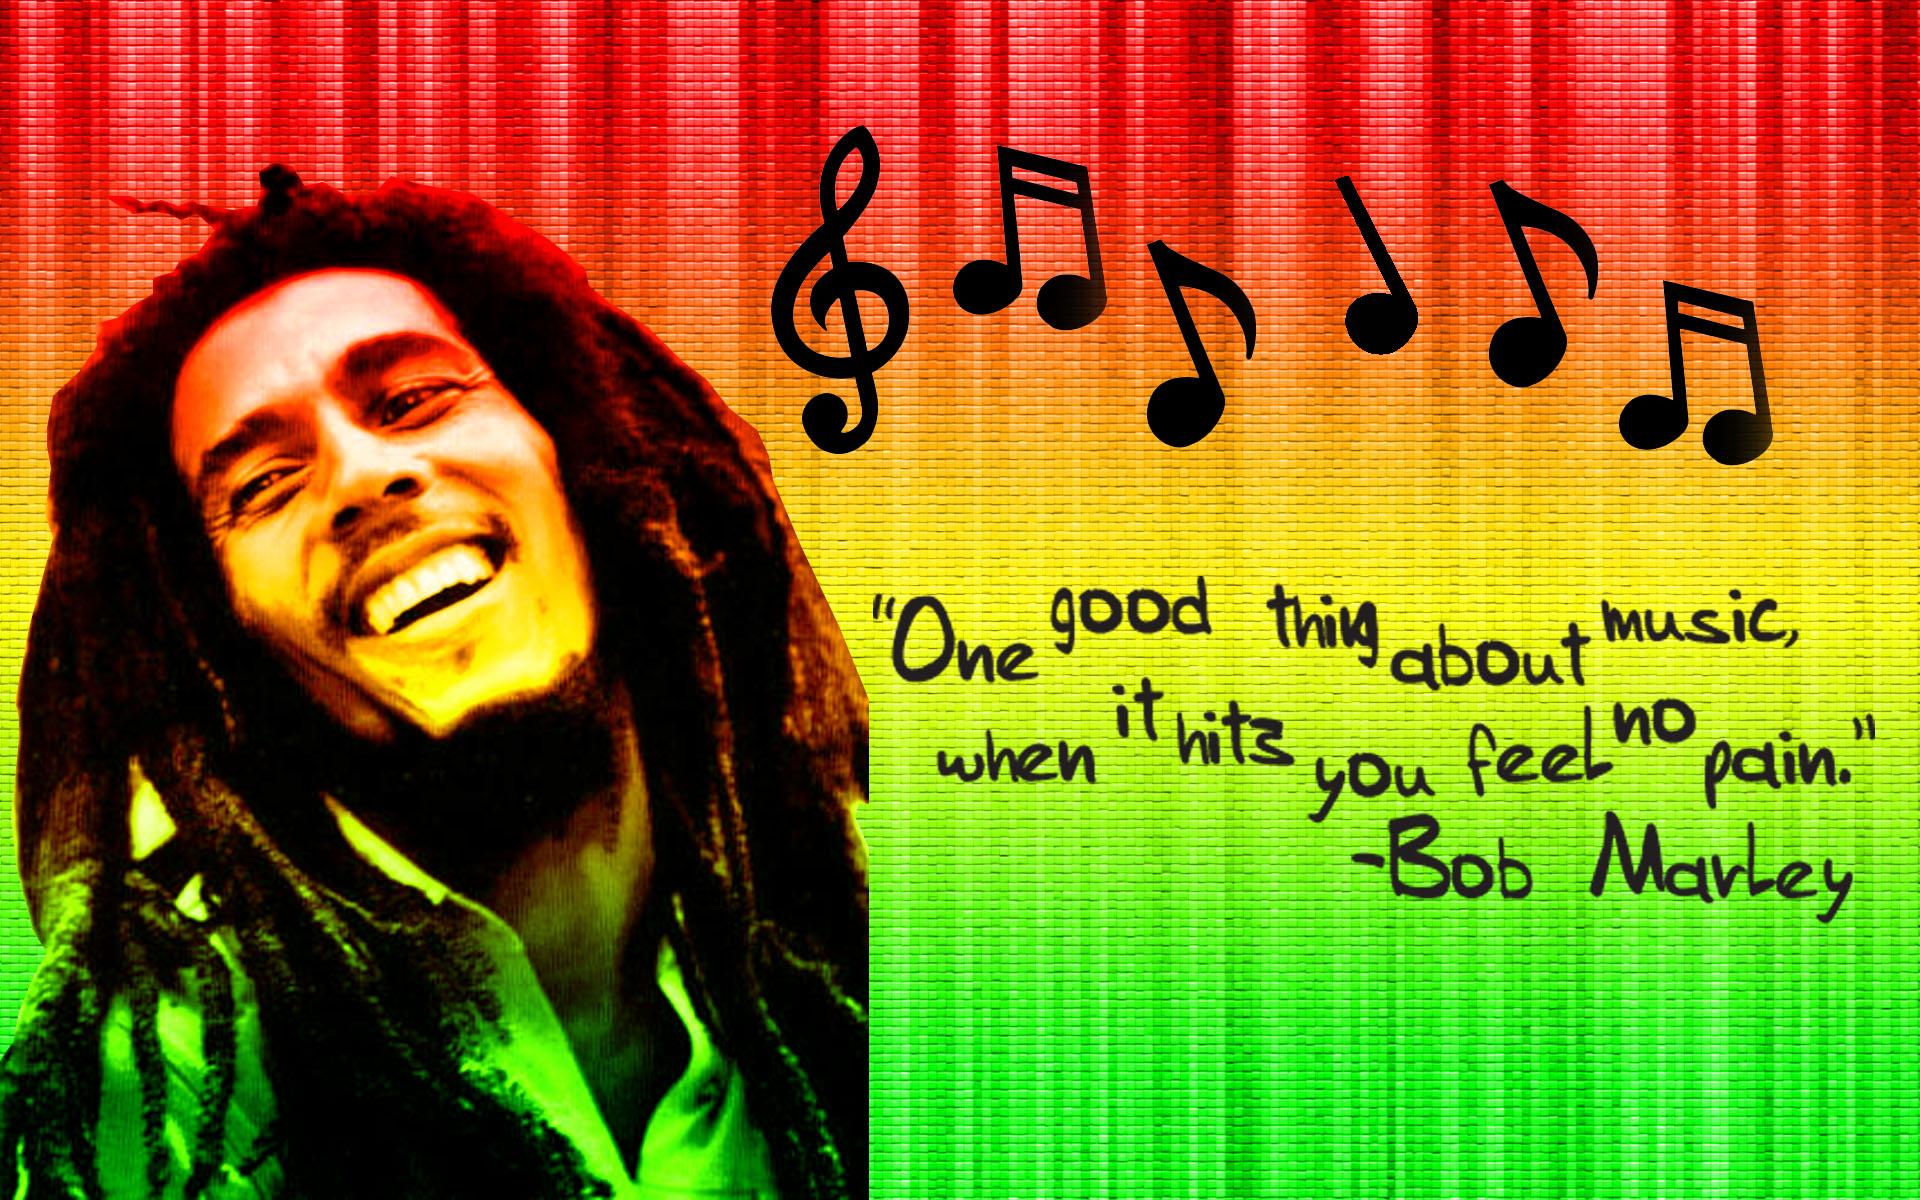 Bob Marley Reggae Music